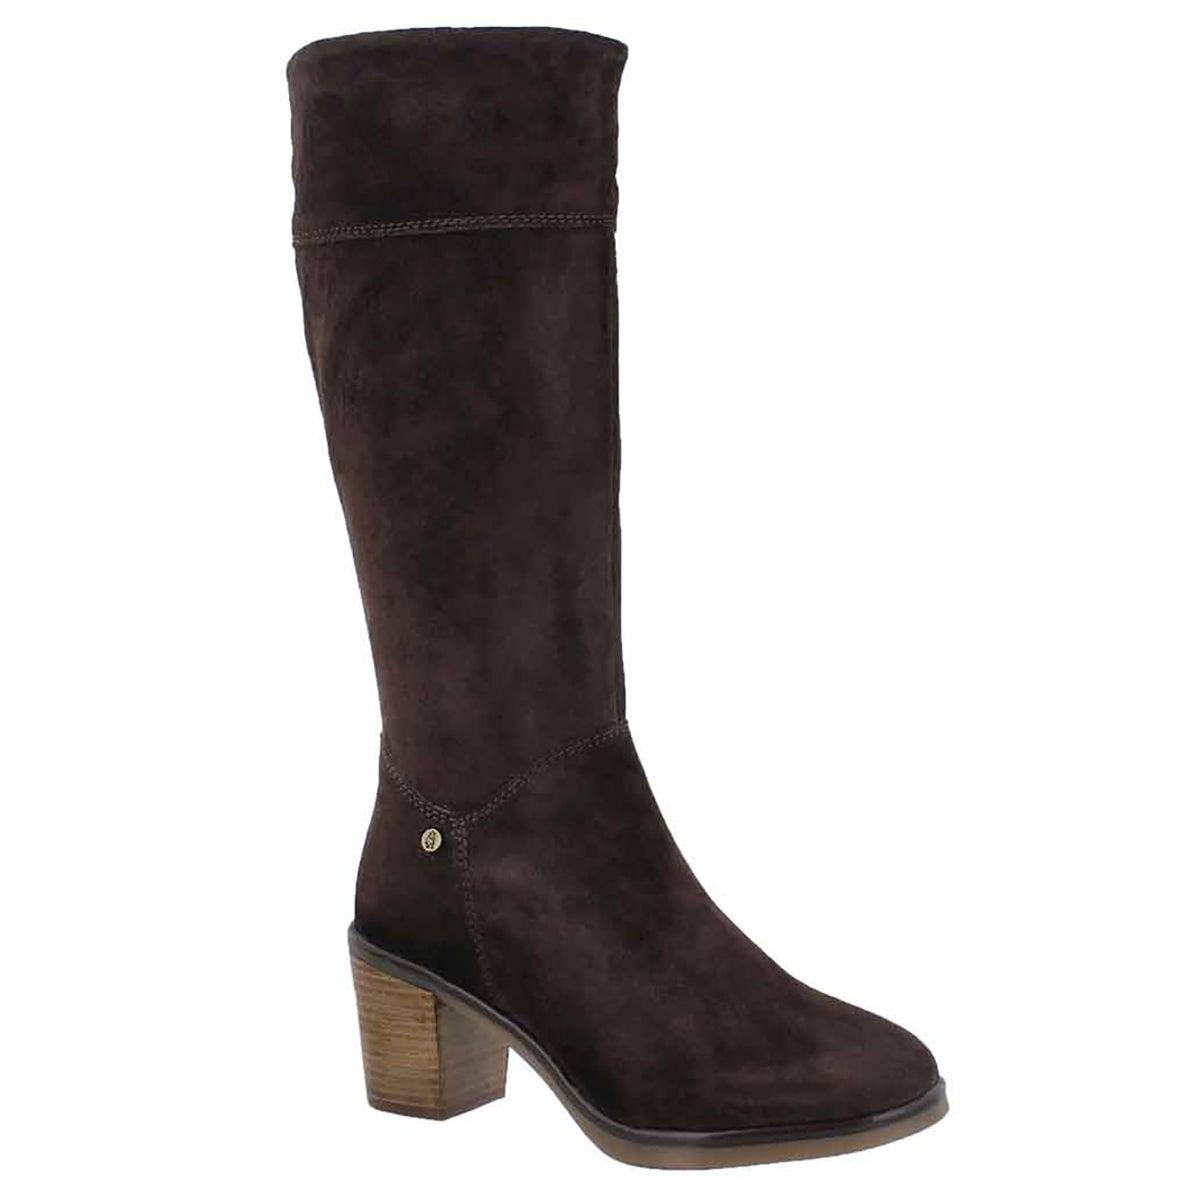 Women's SAUN OLIVYA dark brown high dress boots